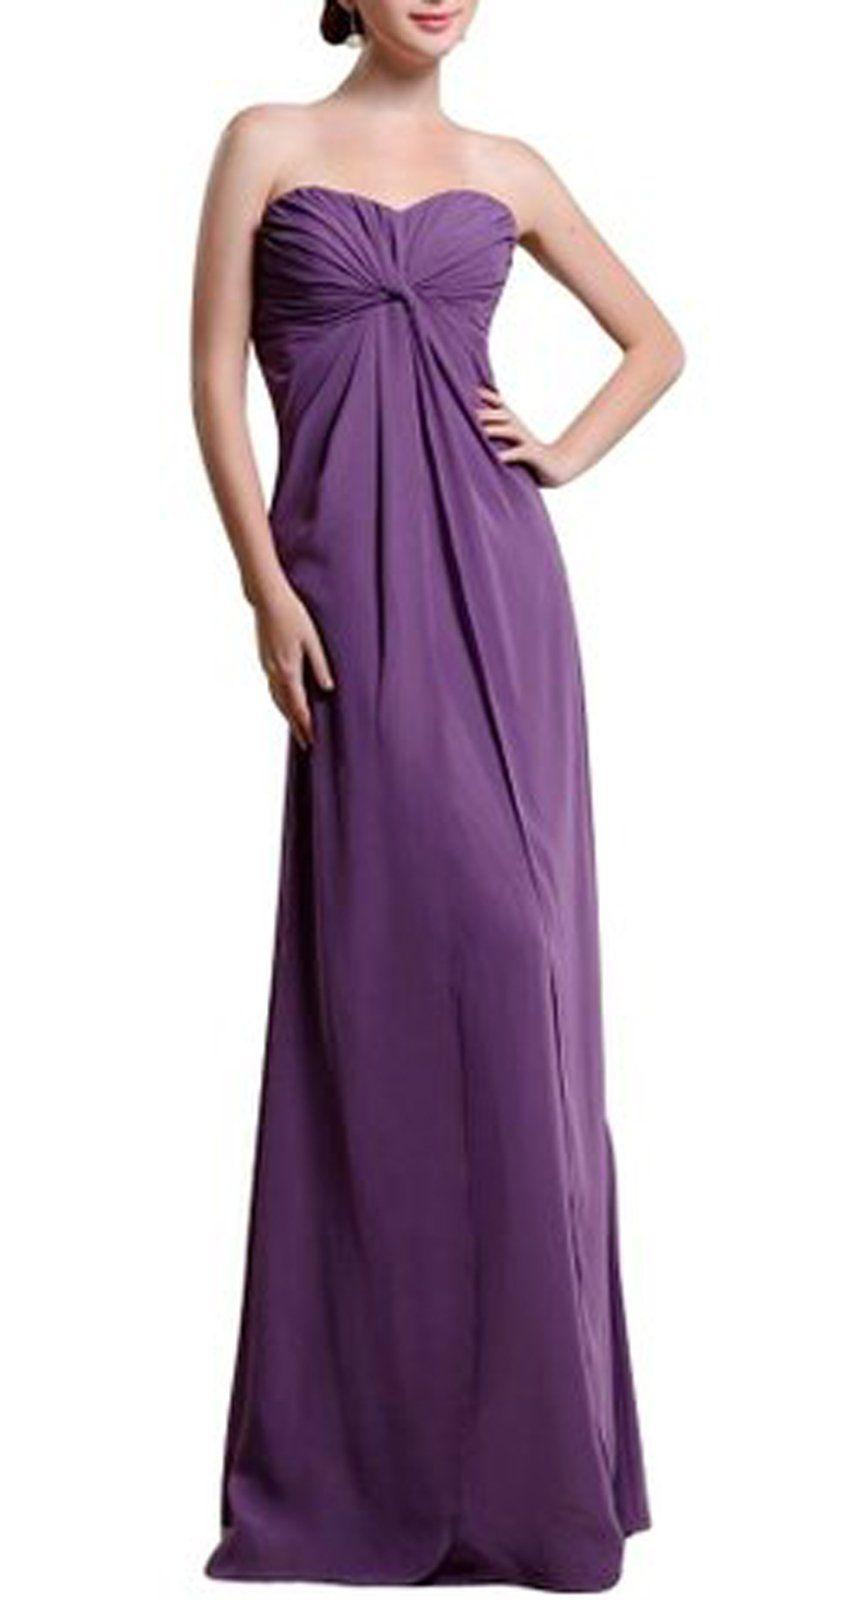 maillsa chiffon strapless bridesmaid dress evening dress prom dress ...